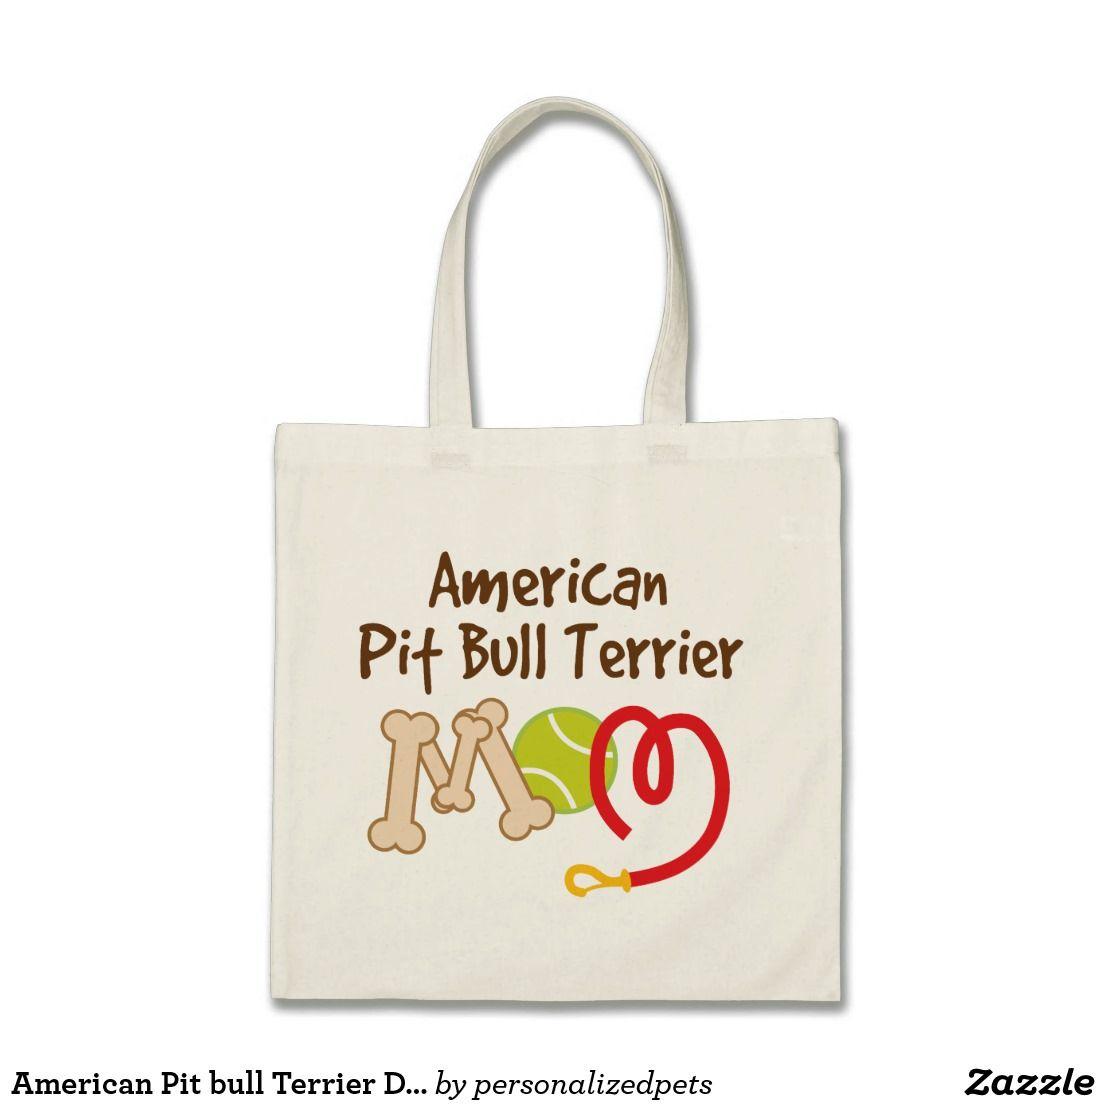 American Pit bull Terrier Dog Breed Mum Gift Tote Bag